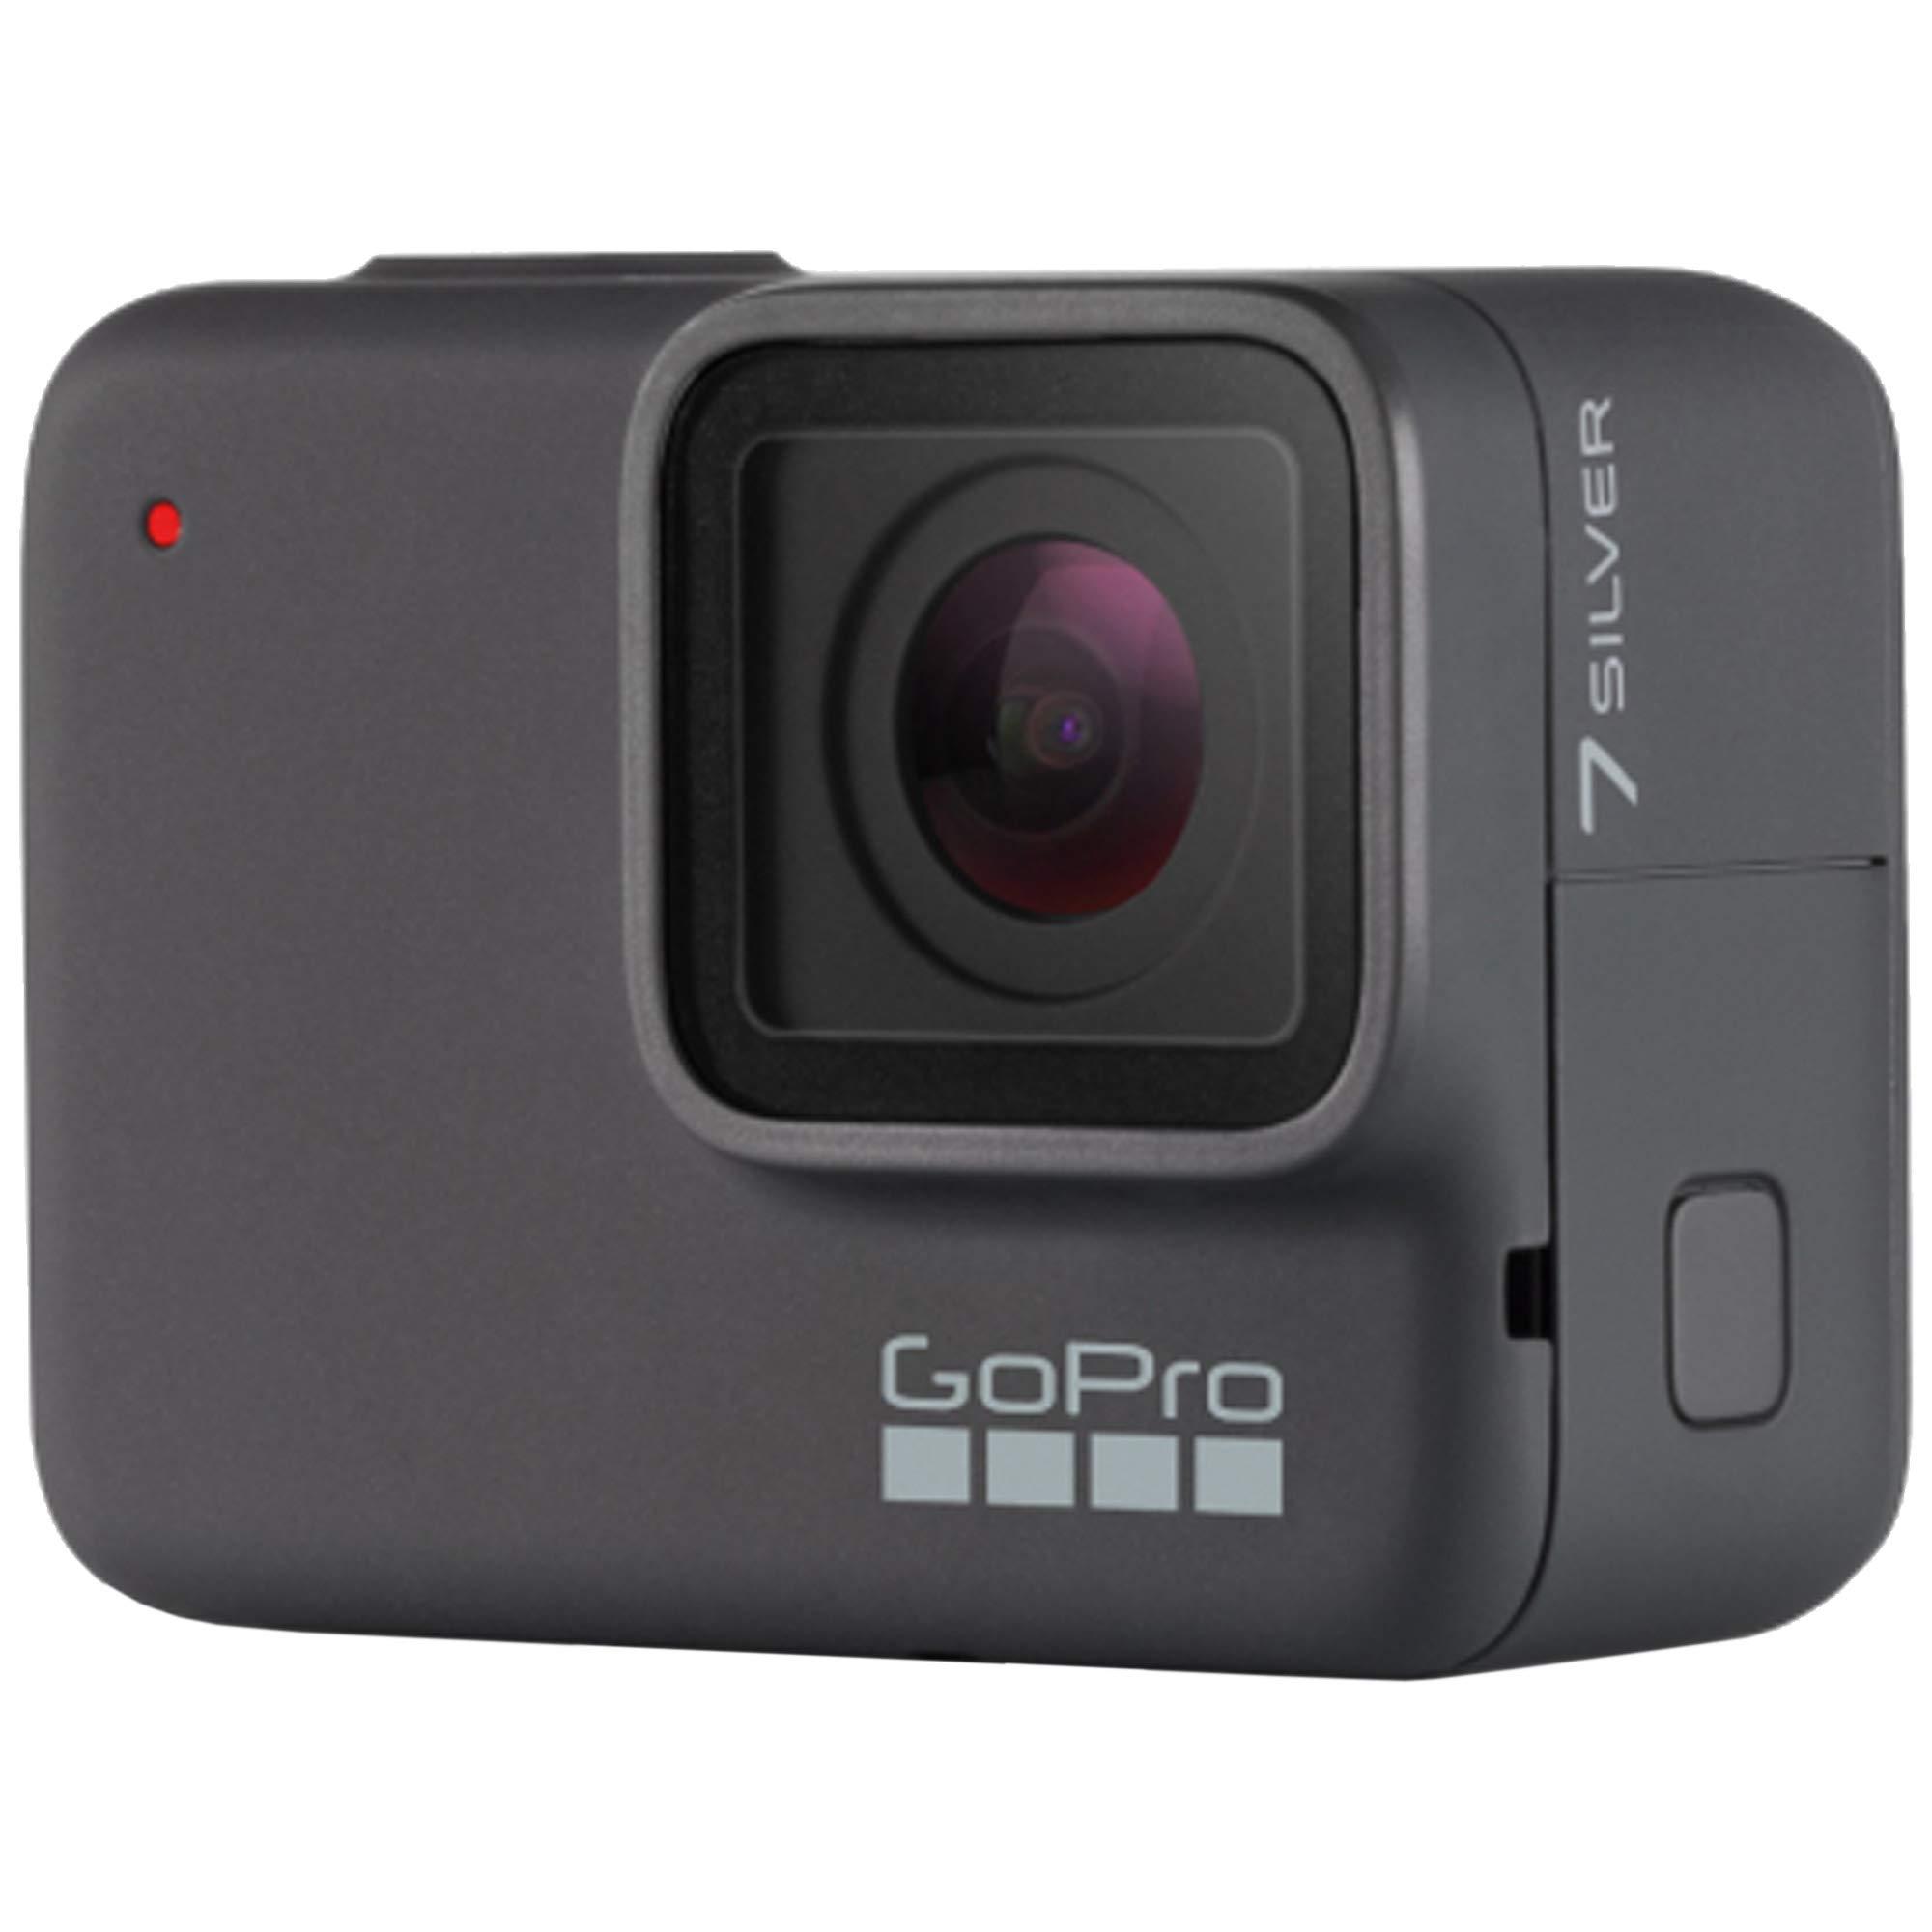 GoPro HERO7 Silver SD Card Bundle